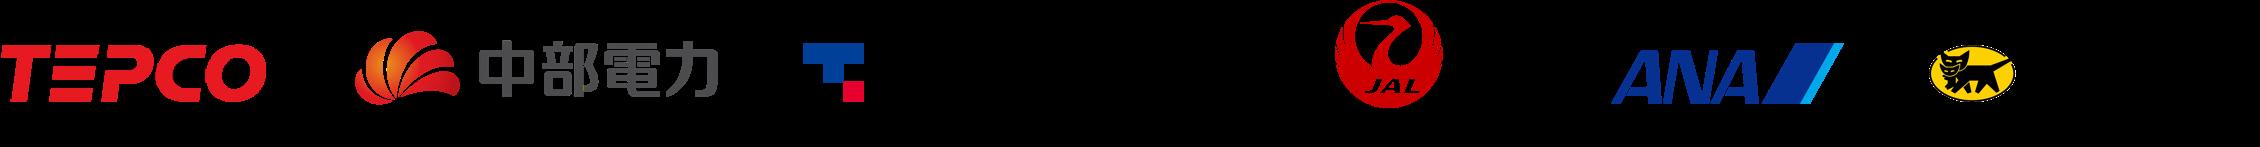 /stf/linecorp/ja/pr/logo0301.png